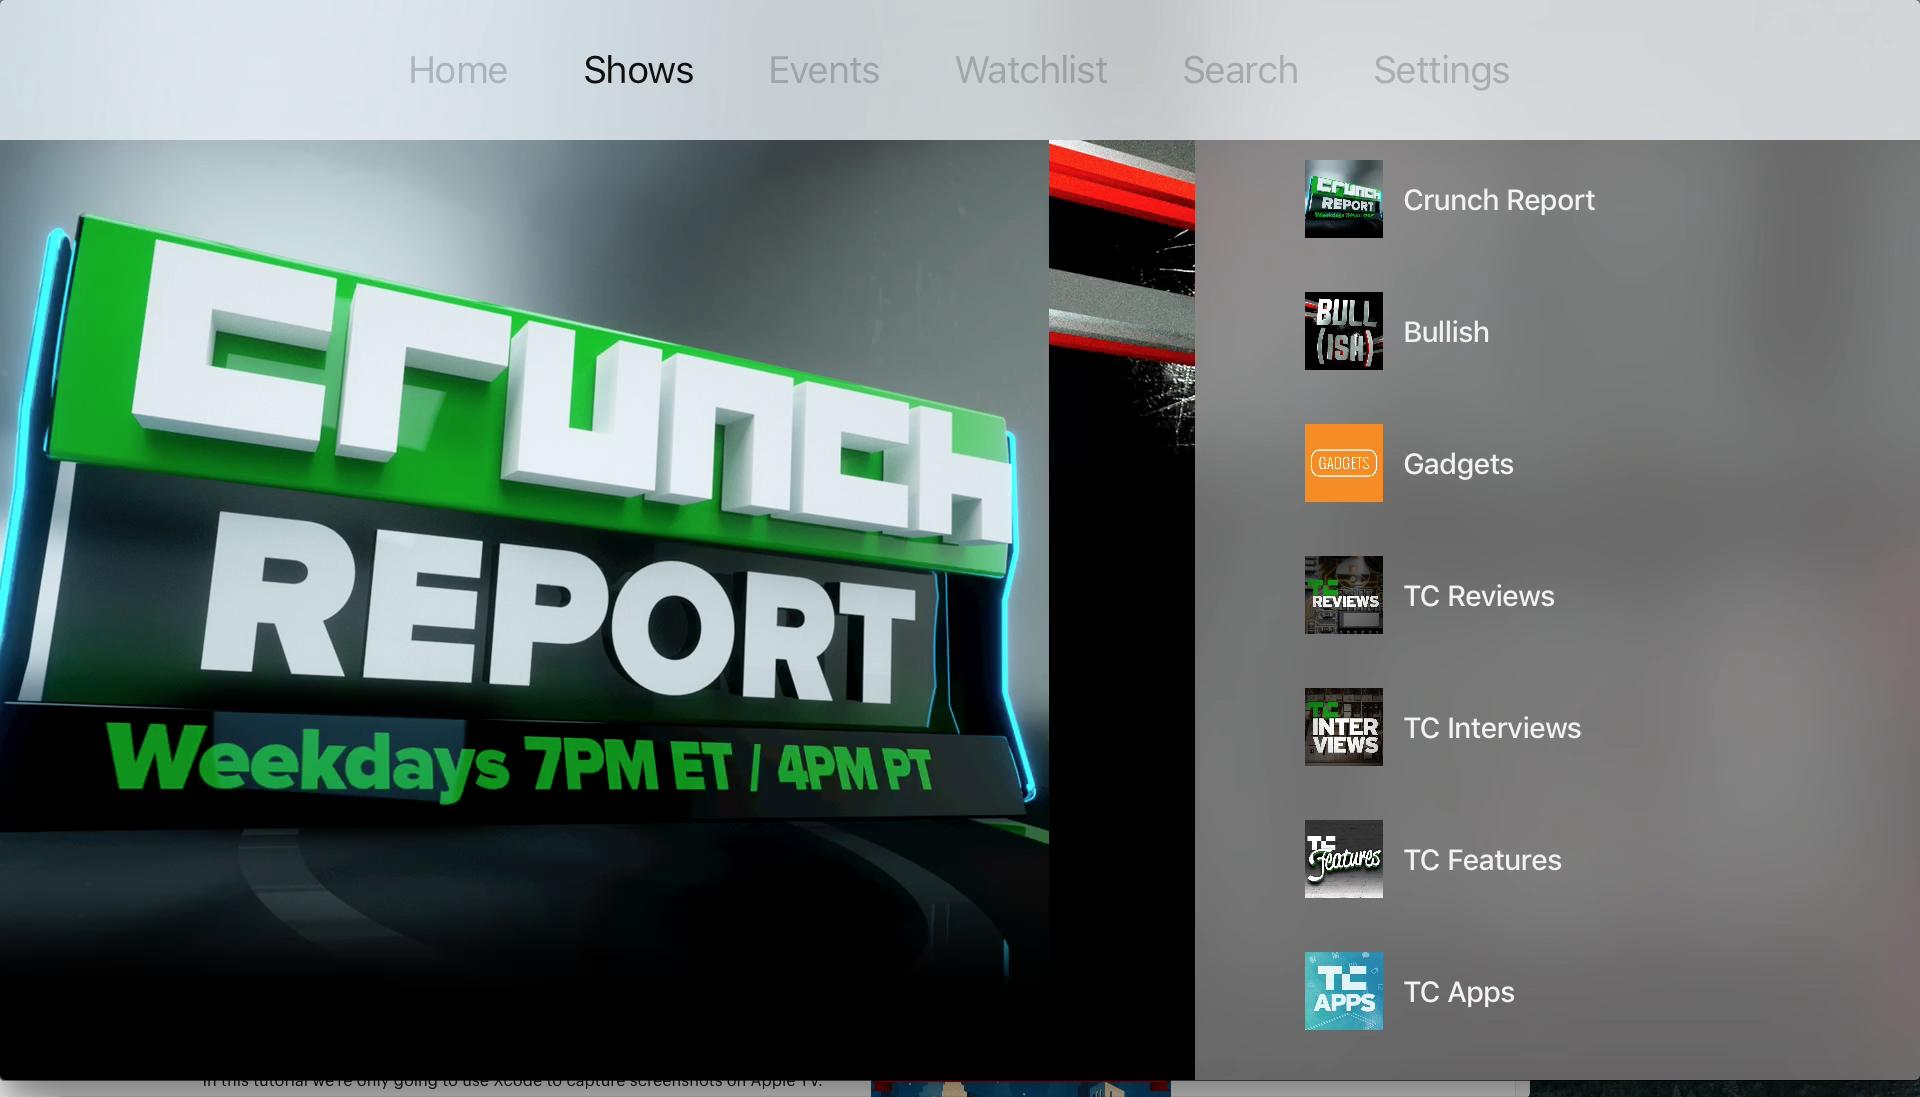 Pin on Apple TV (tvOS) UI/UX & App Icon Designs